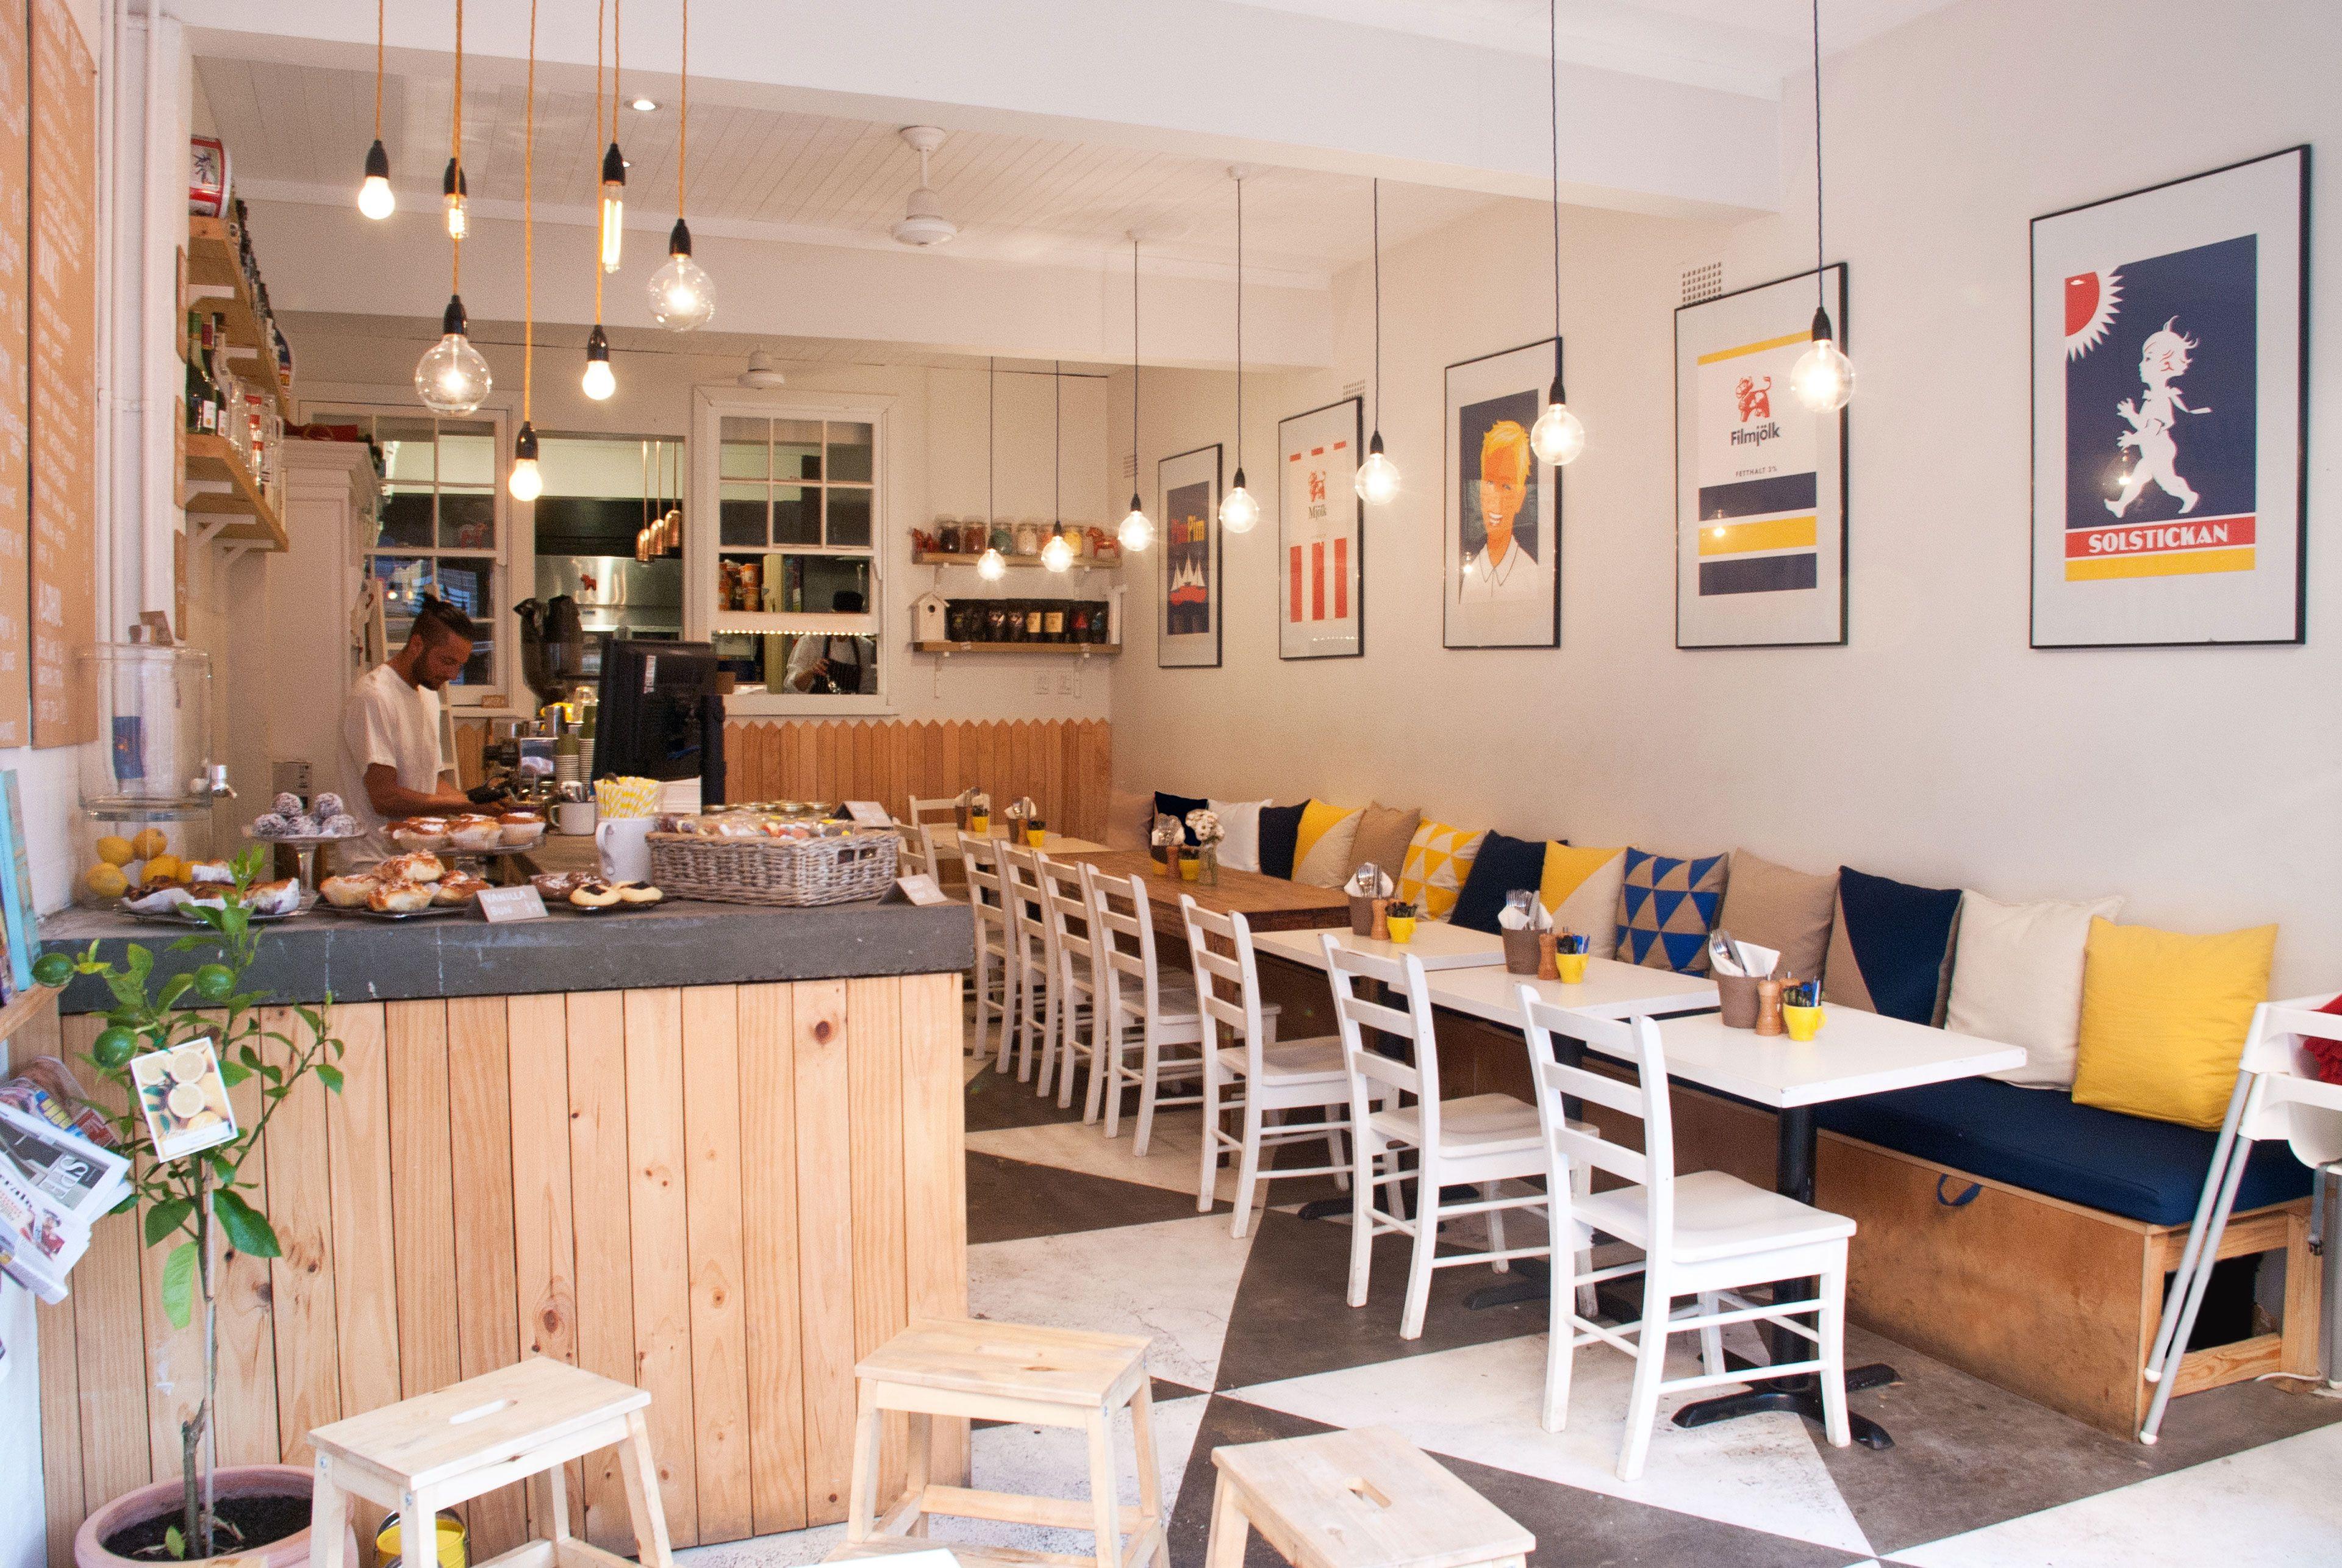 Fika Swedish Kitchen Scandinavian Cafe Cafe Interior Design Www Fikaswedishkitchen Com Au Desain Interior Dekorasi Interior Interior